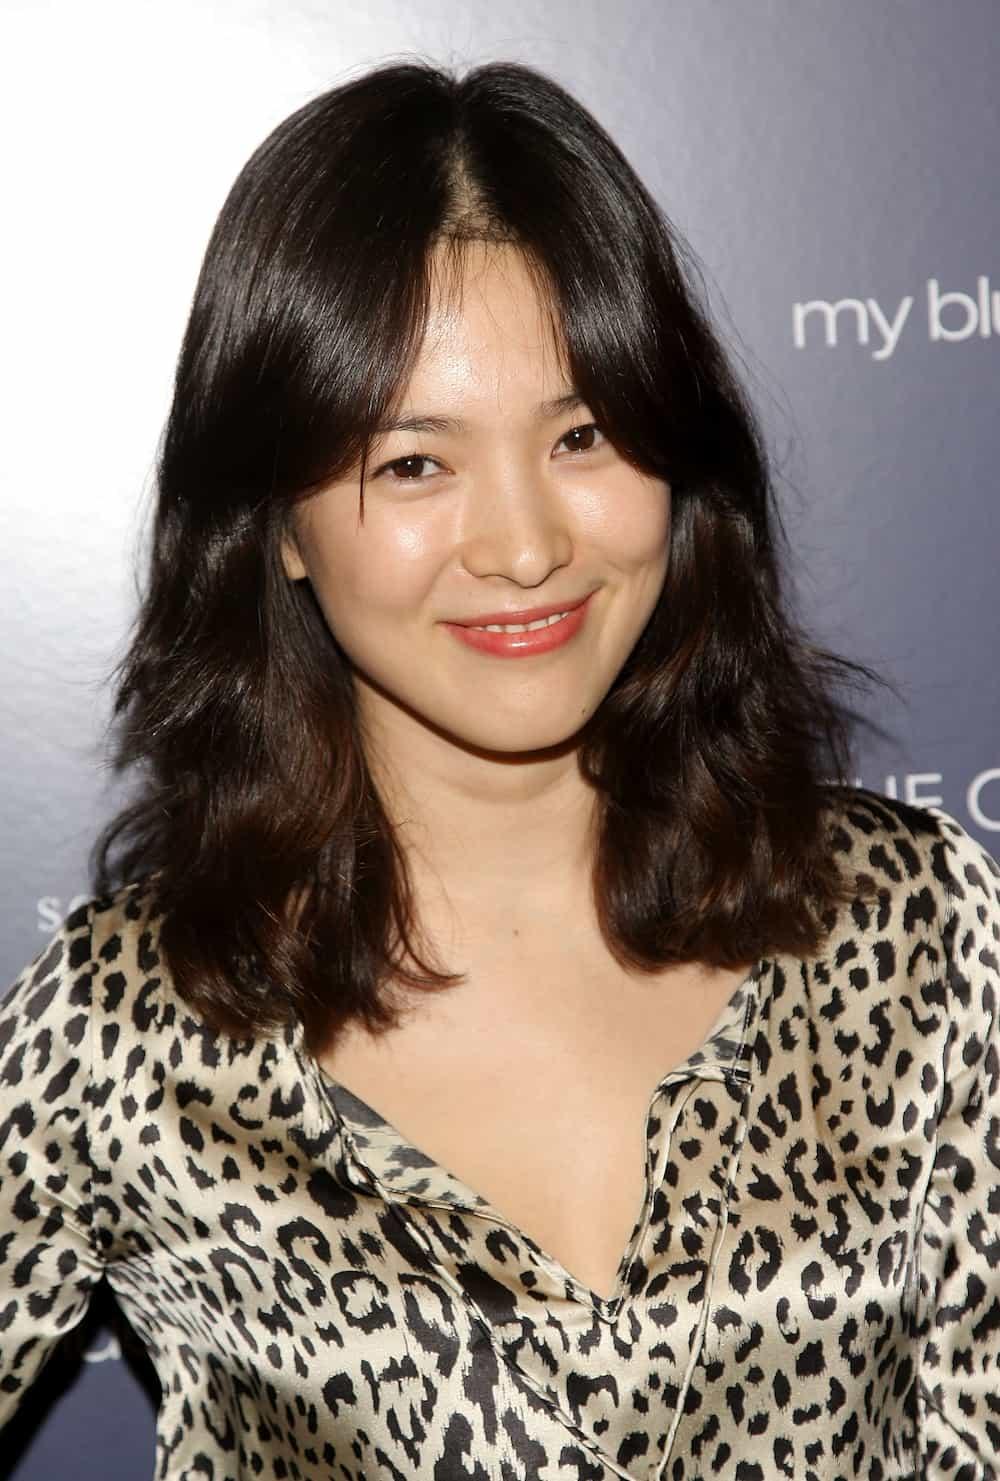 Song Hye Kyo age